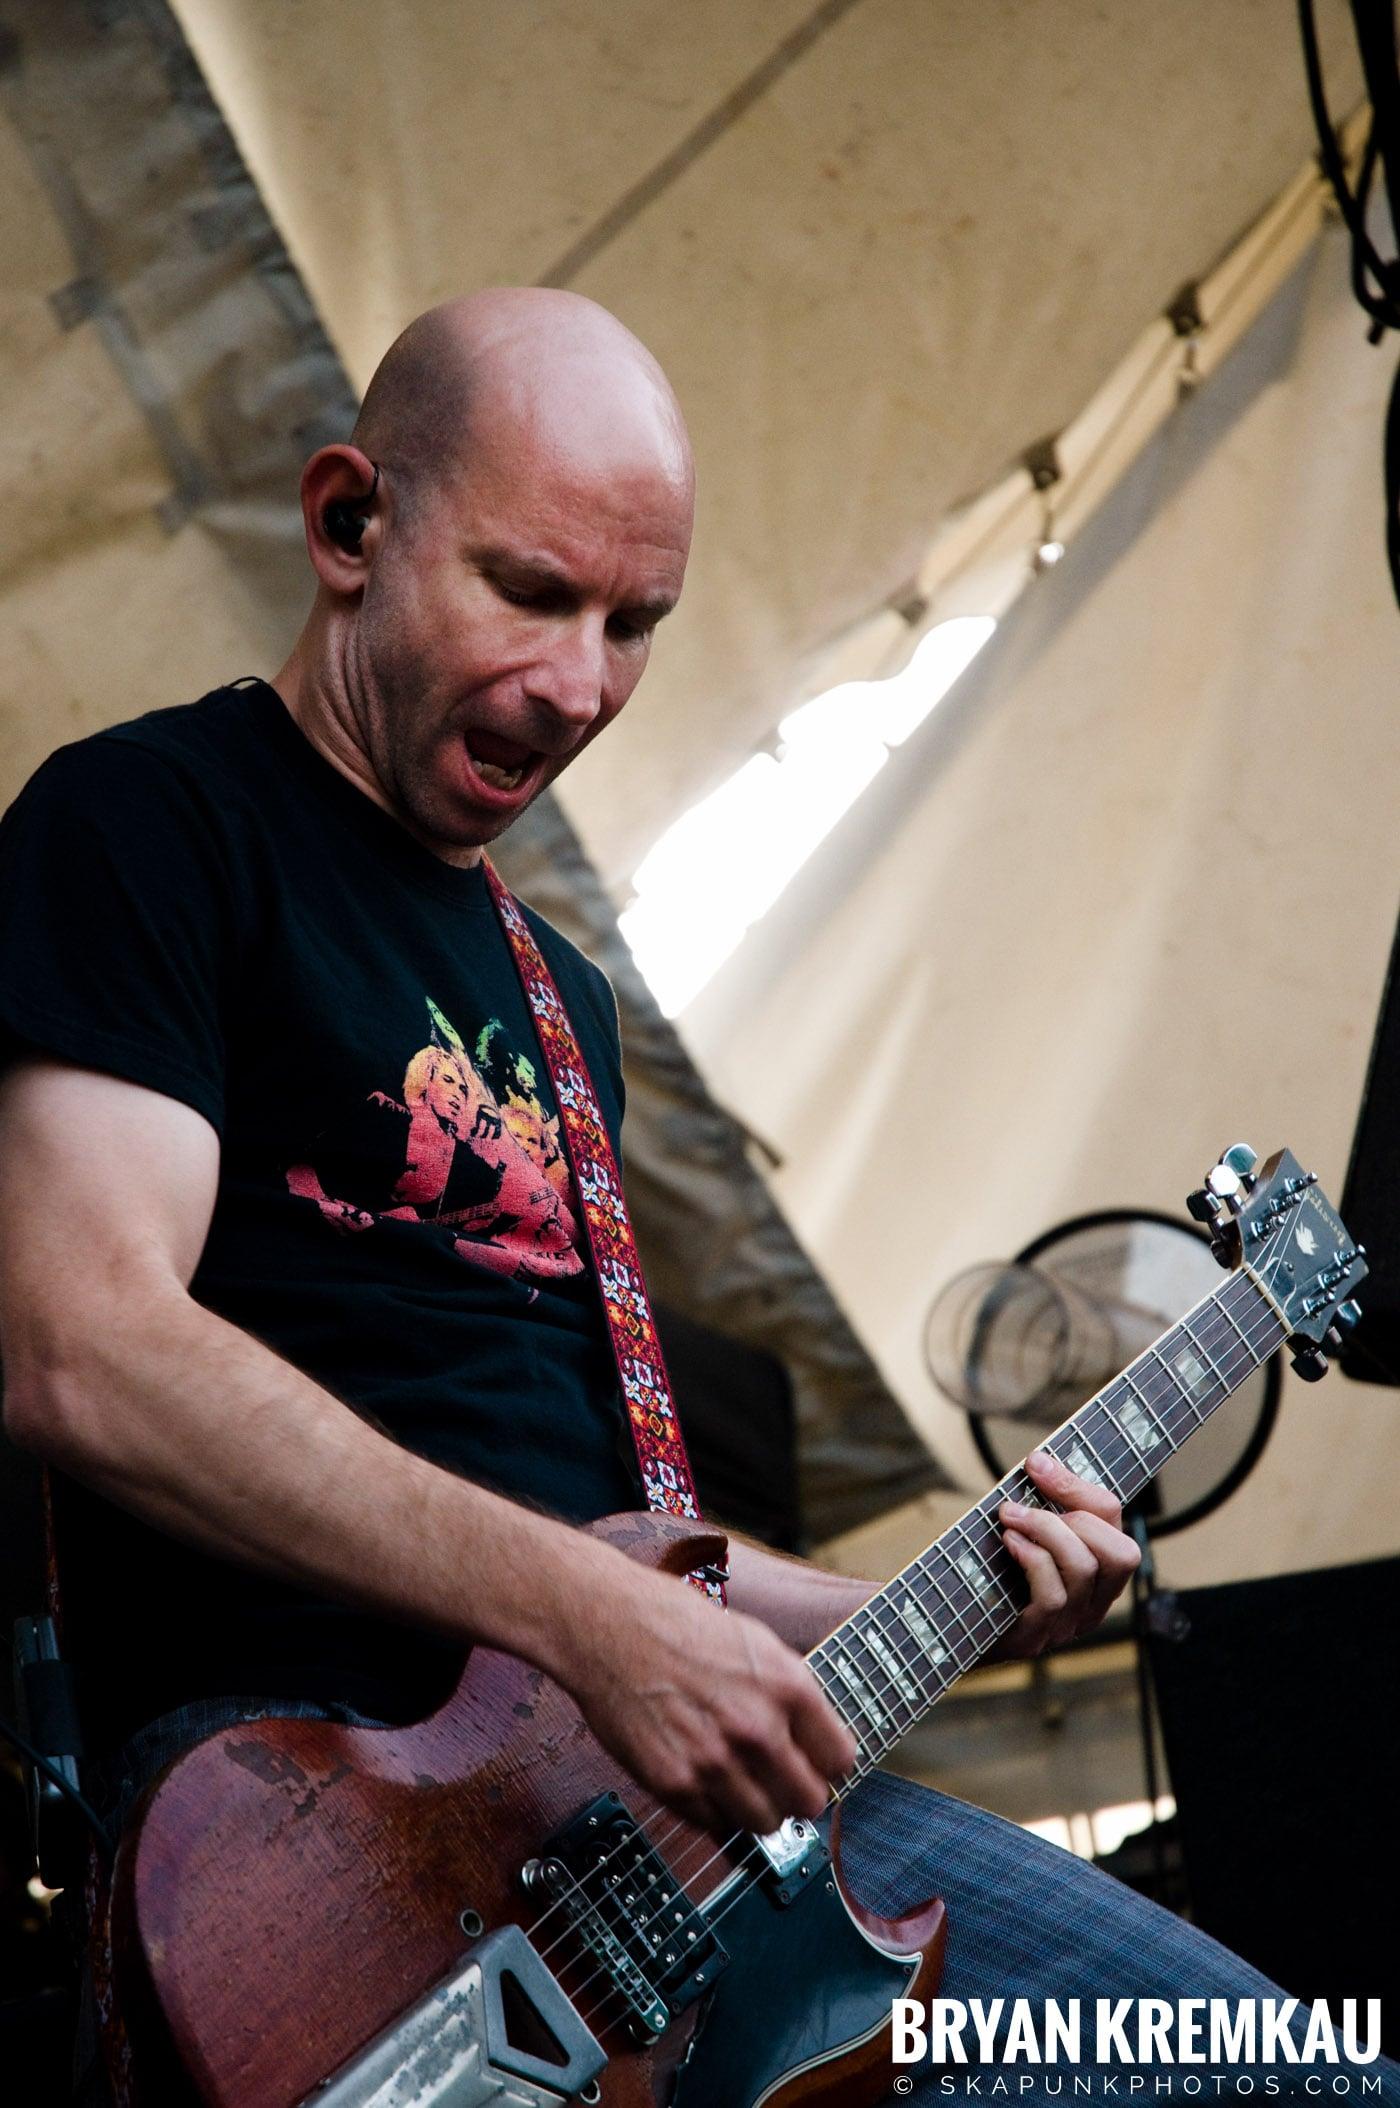 Bad Religion @ Warped Tour 2009, Scranton PA - 07.15.09 (13)